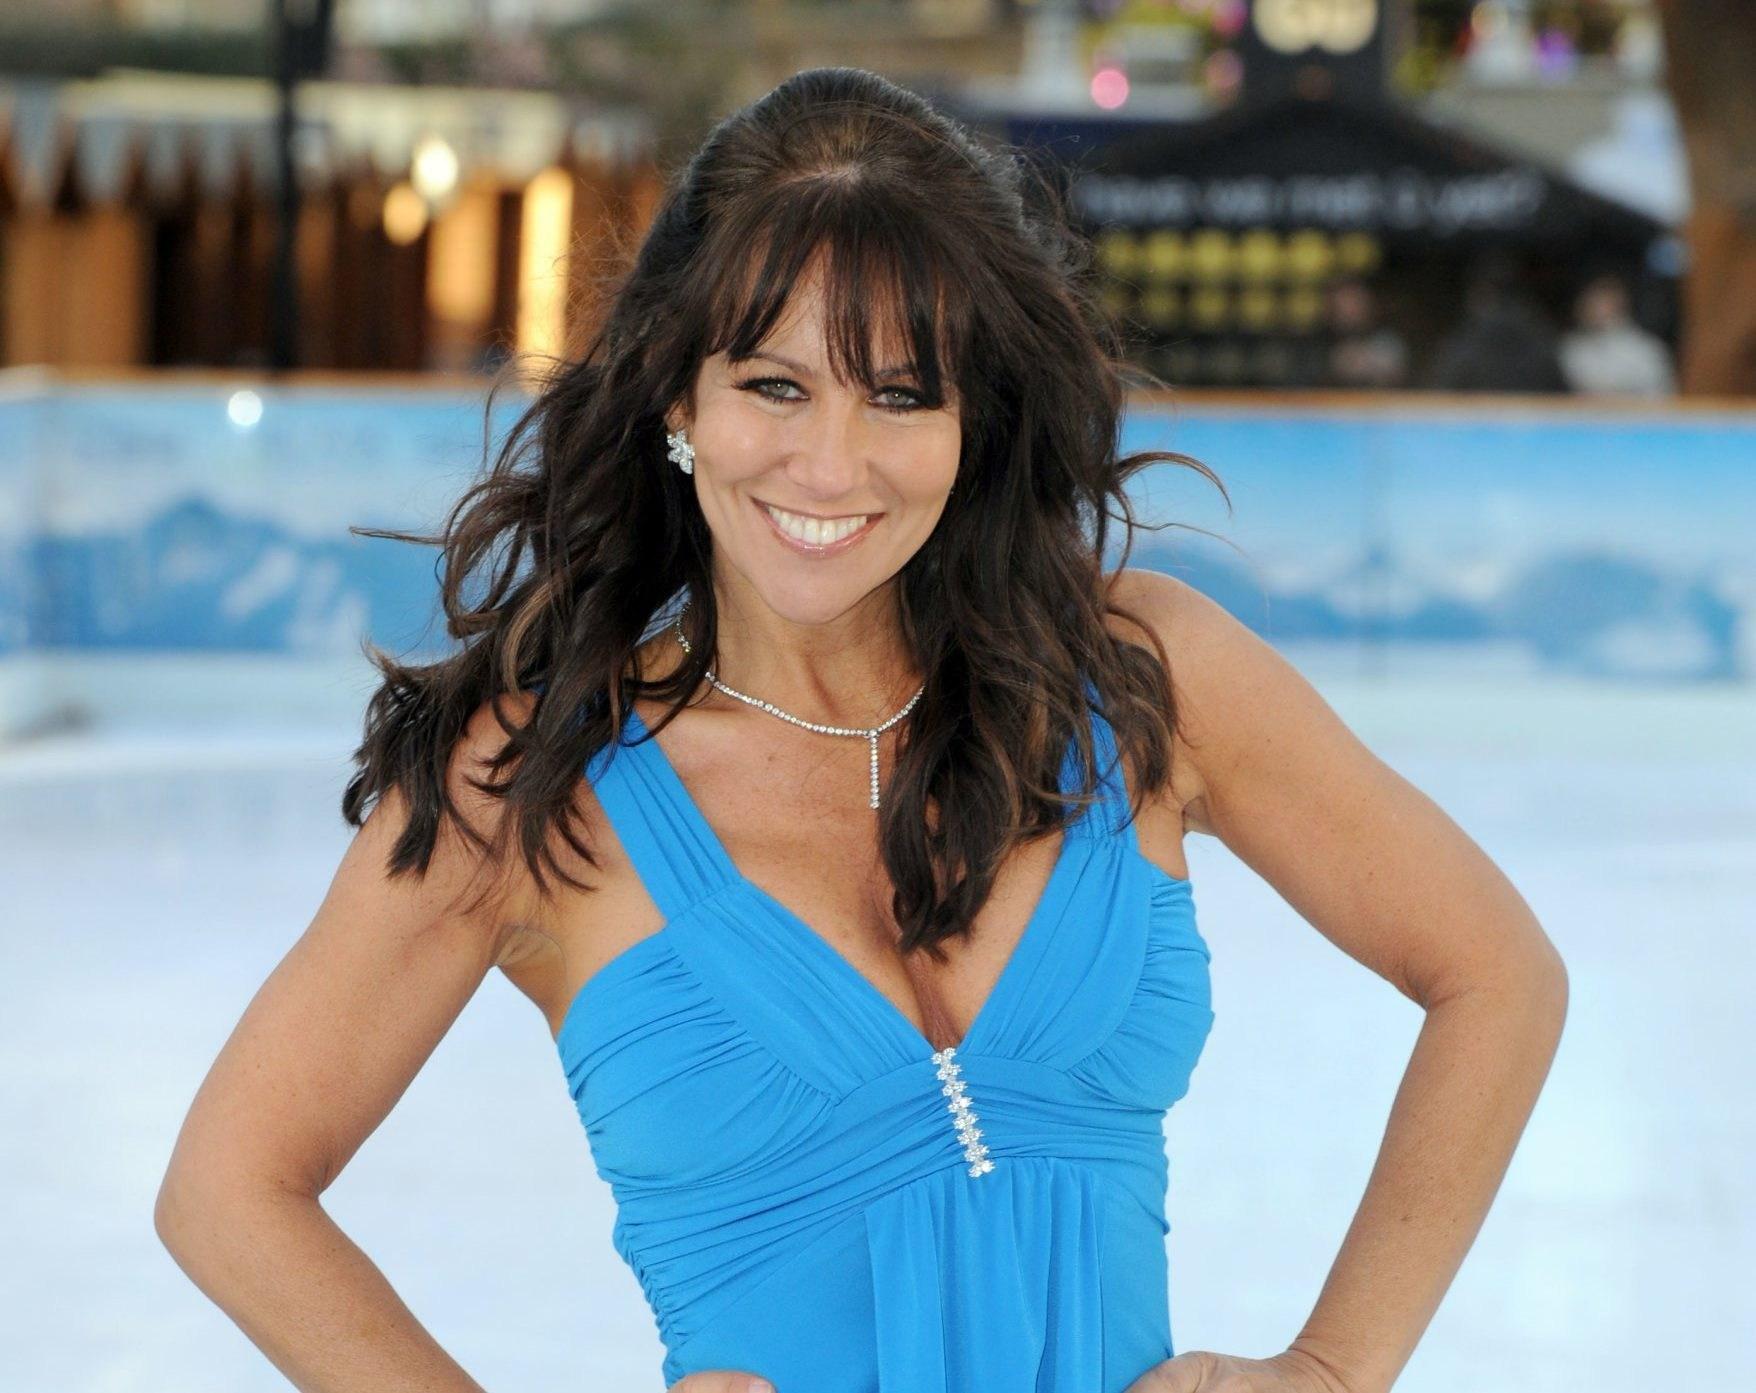 Linda Lusardi 'feels so much better' after traumatic coronavirus battle